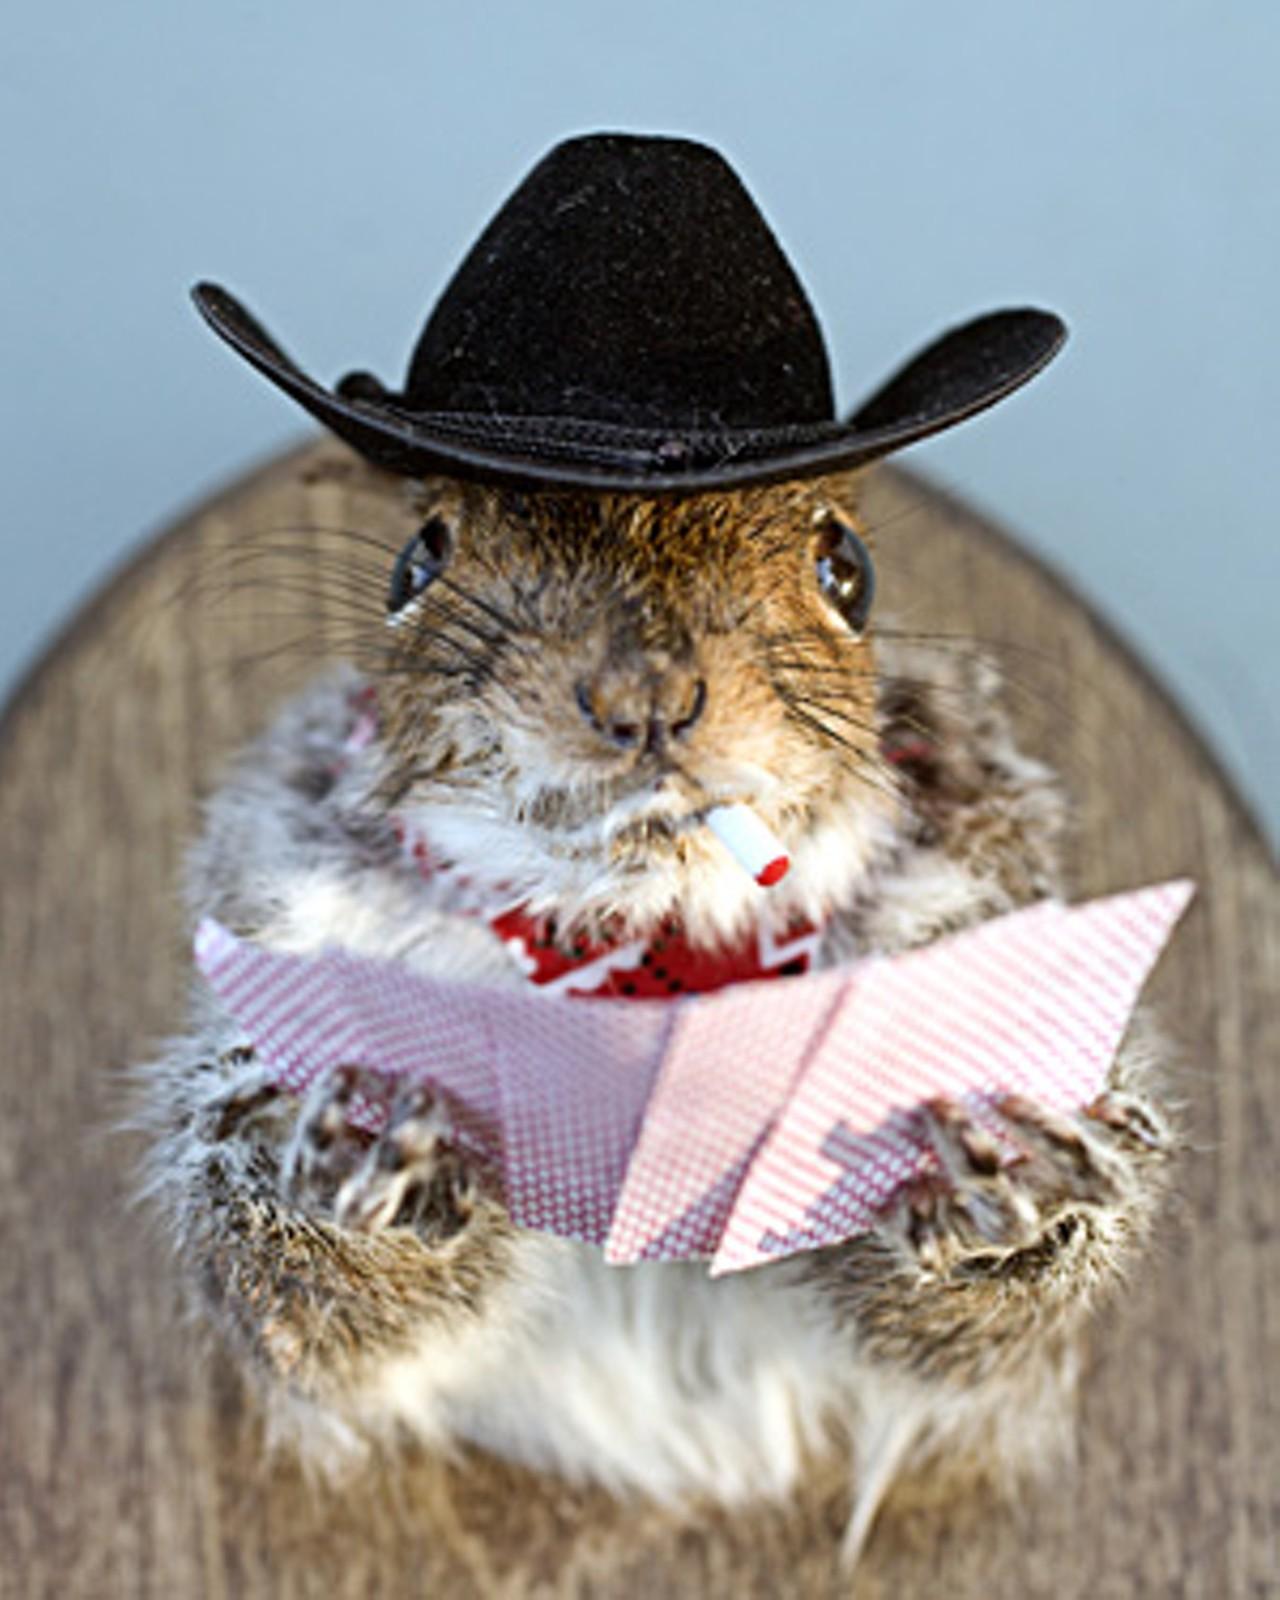 Mount My Squirrel Local Taxidermist Rick Nadeau Has A Lot